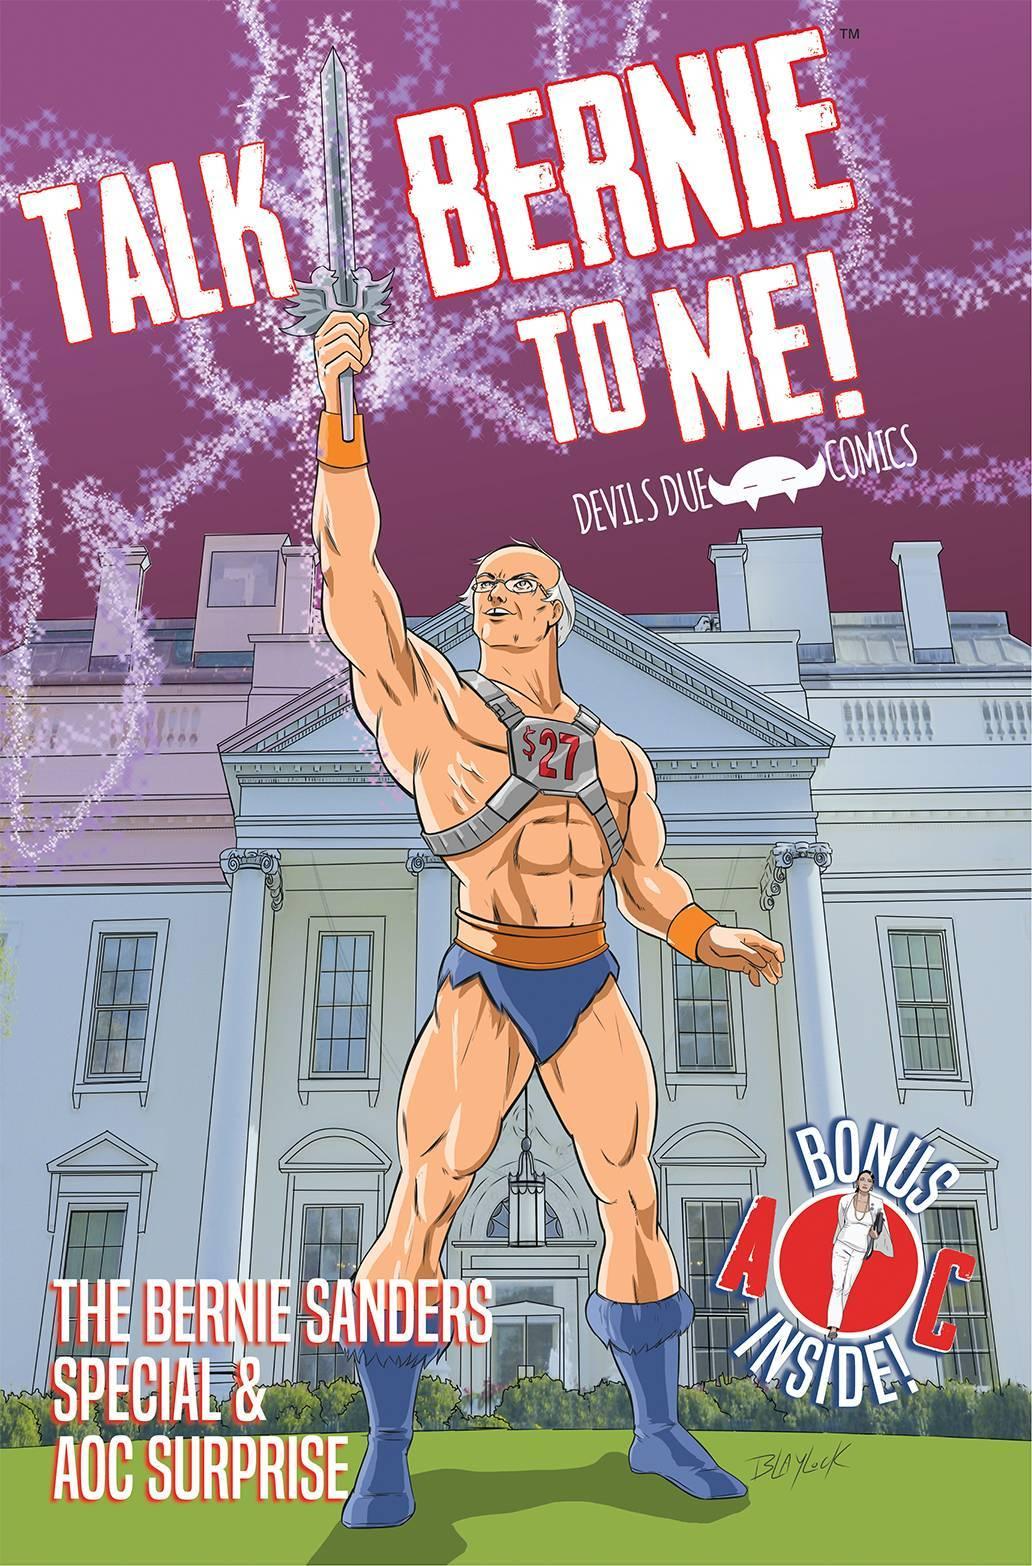 Bernie Sanders Becomes Superhero in New Comic Book